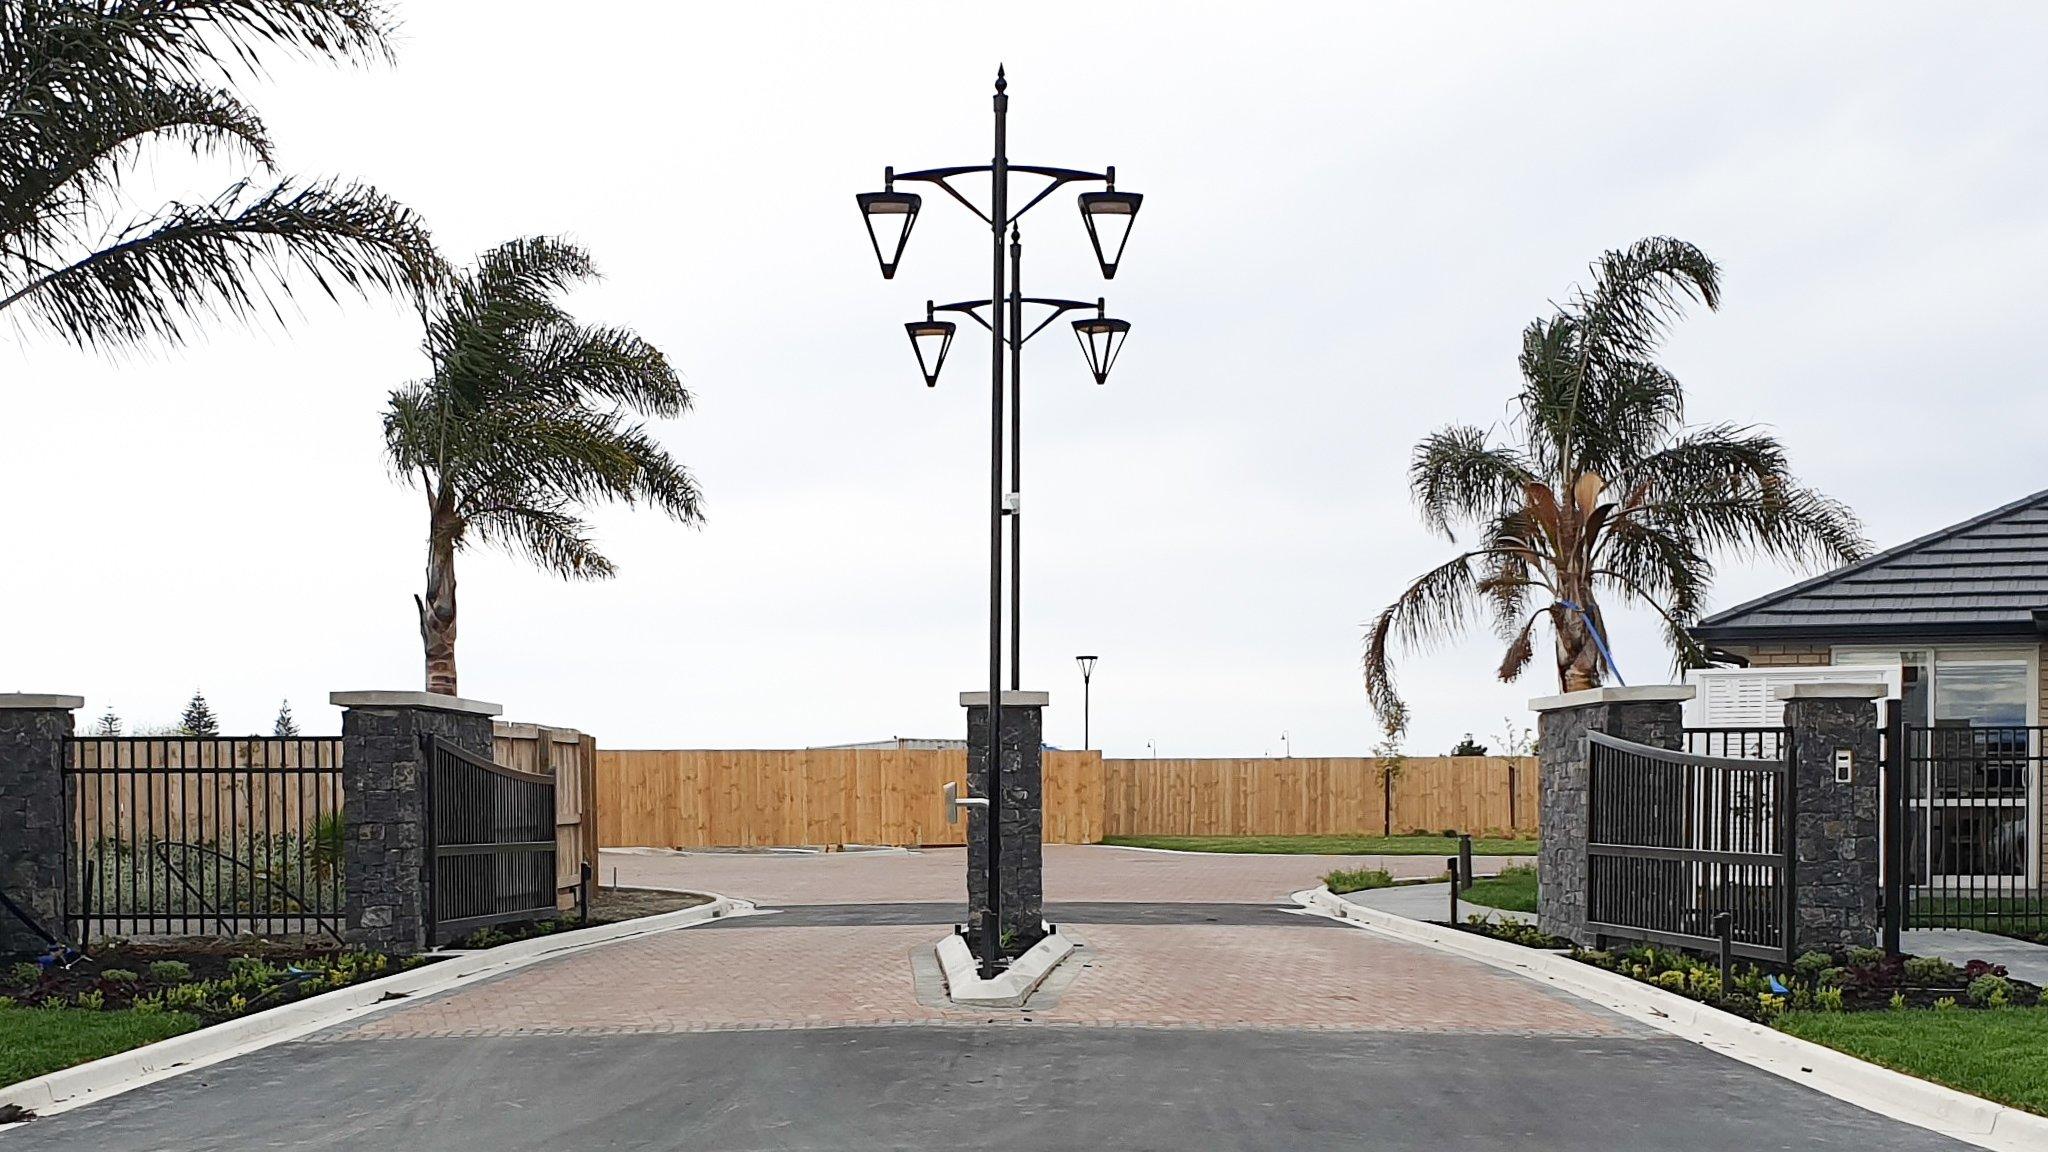 Summerset palms driveway entrnace